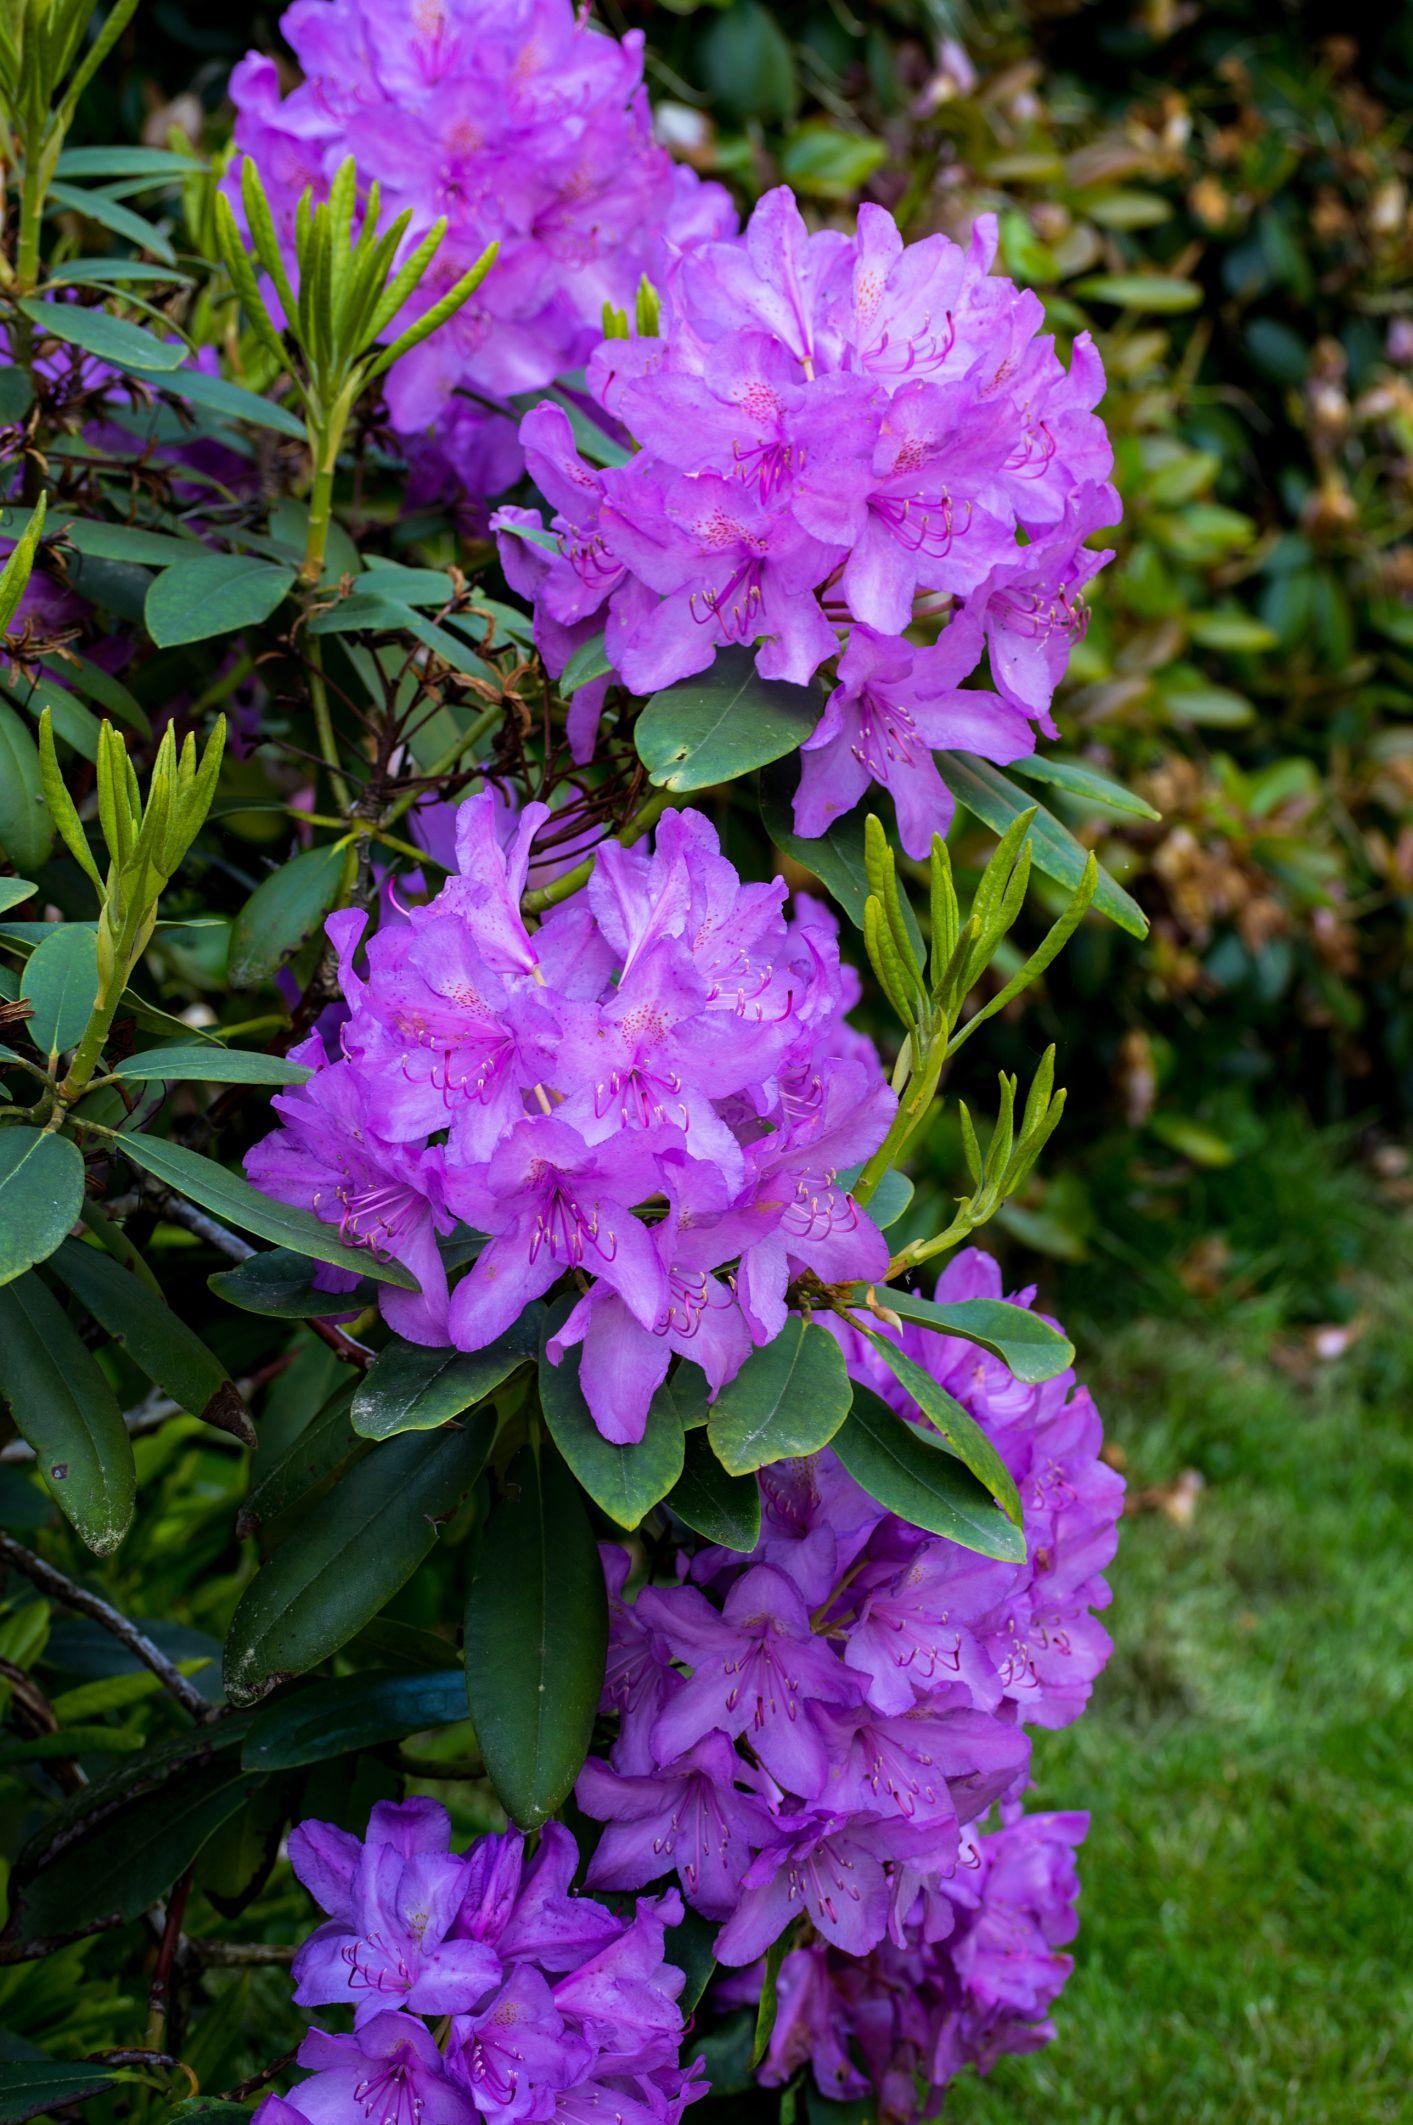 12 Flowers With Hidden Meanings Purple flowers